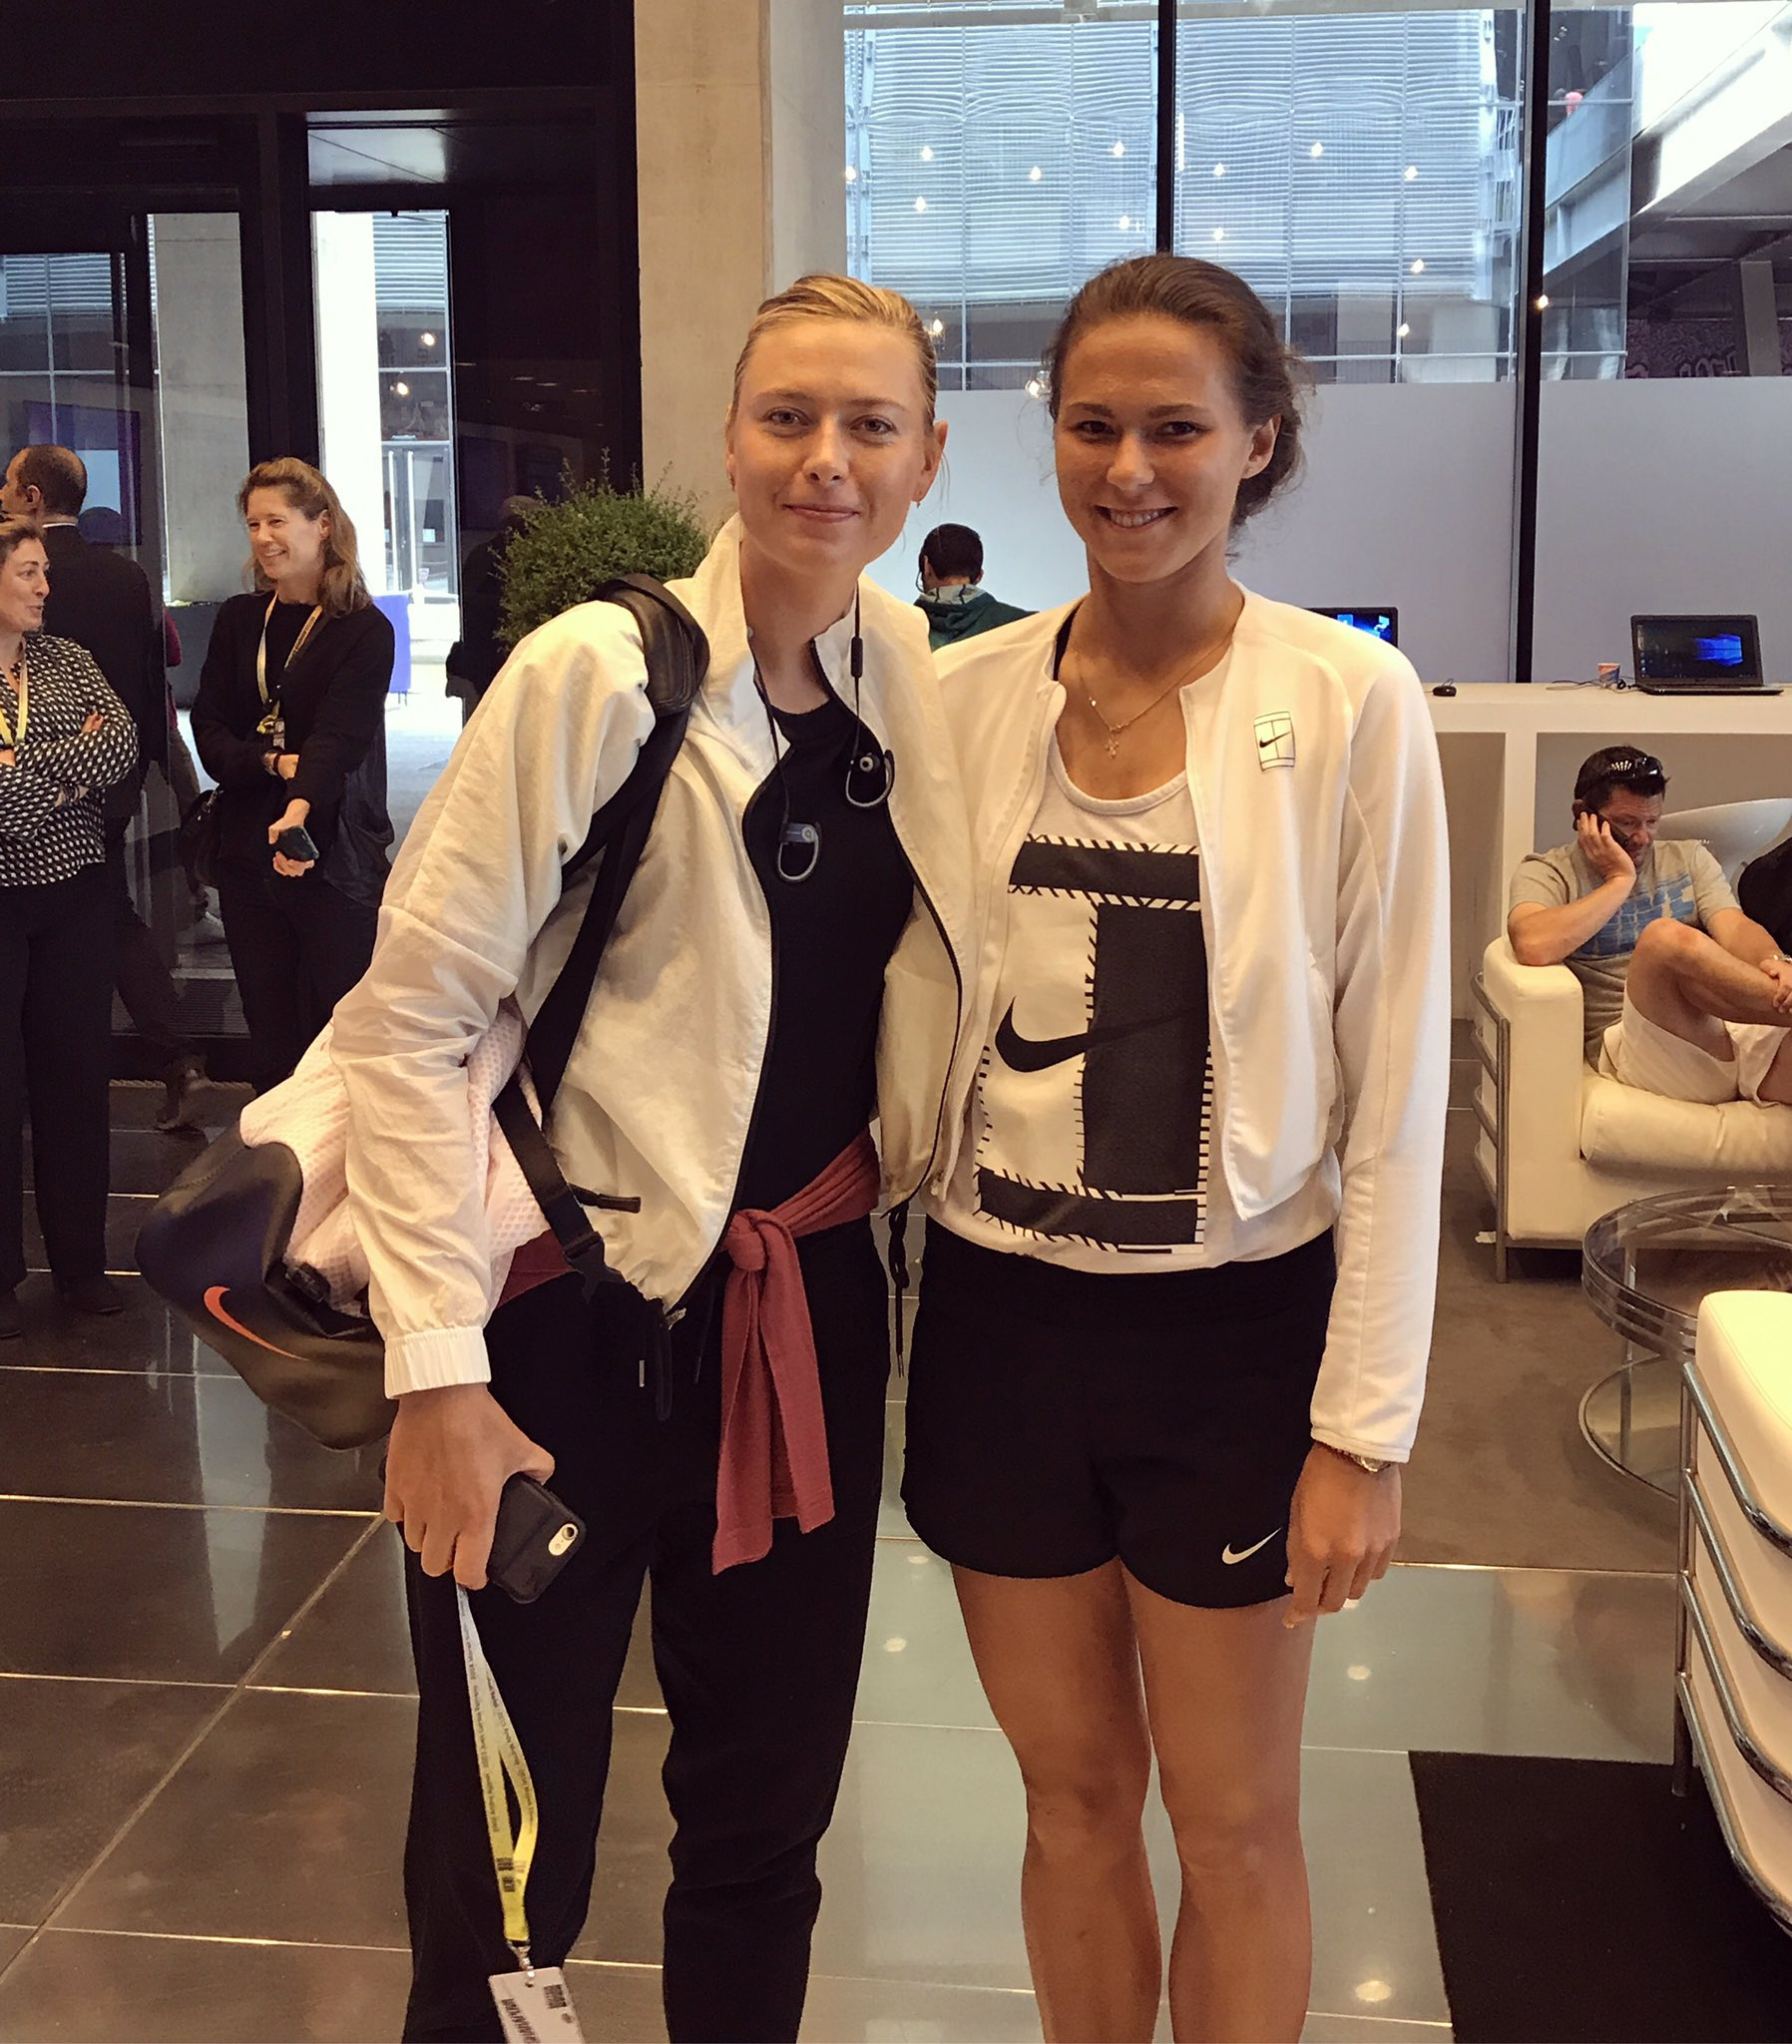 ¿Cuánto mide Maria Sharapova? - Altura - Real height C_EeAAIXoAA046C?format=jpg&name=large